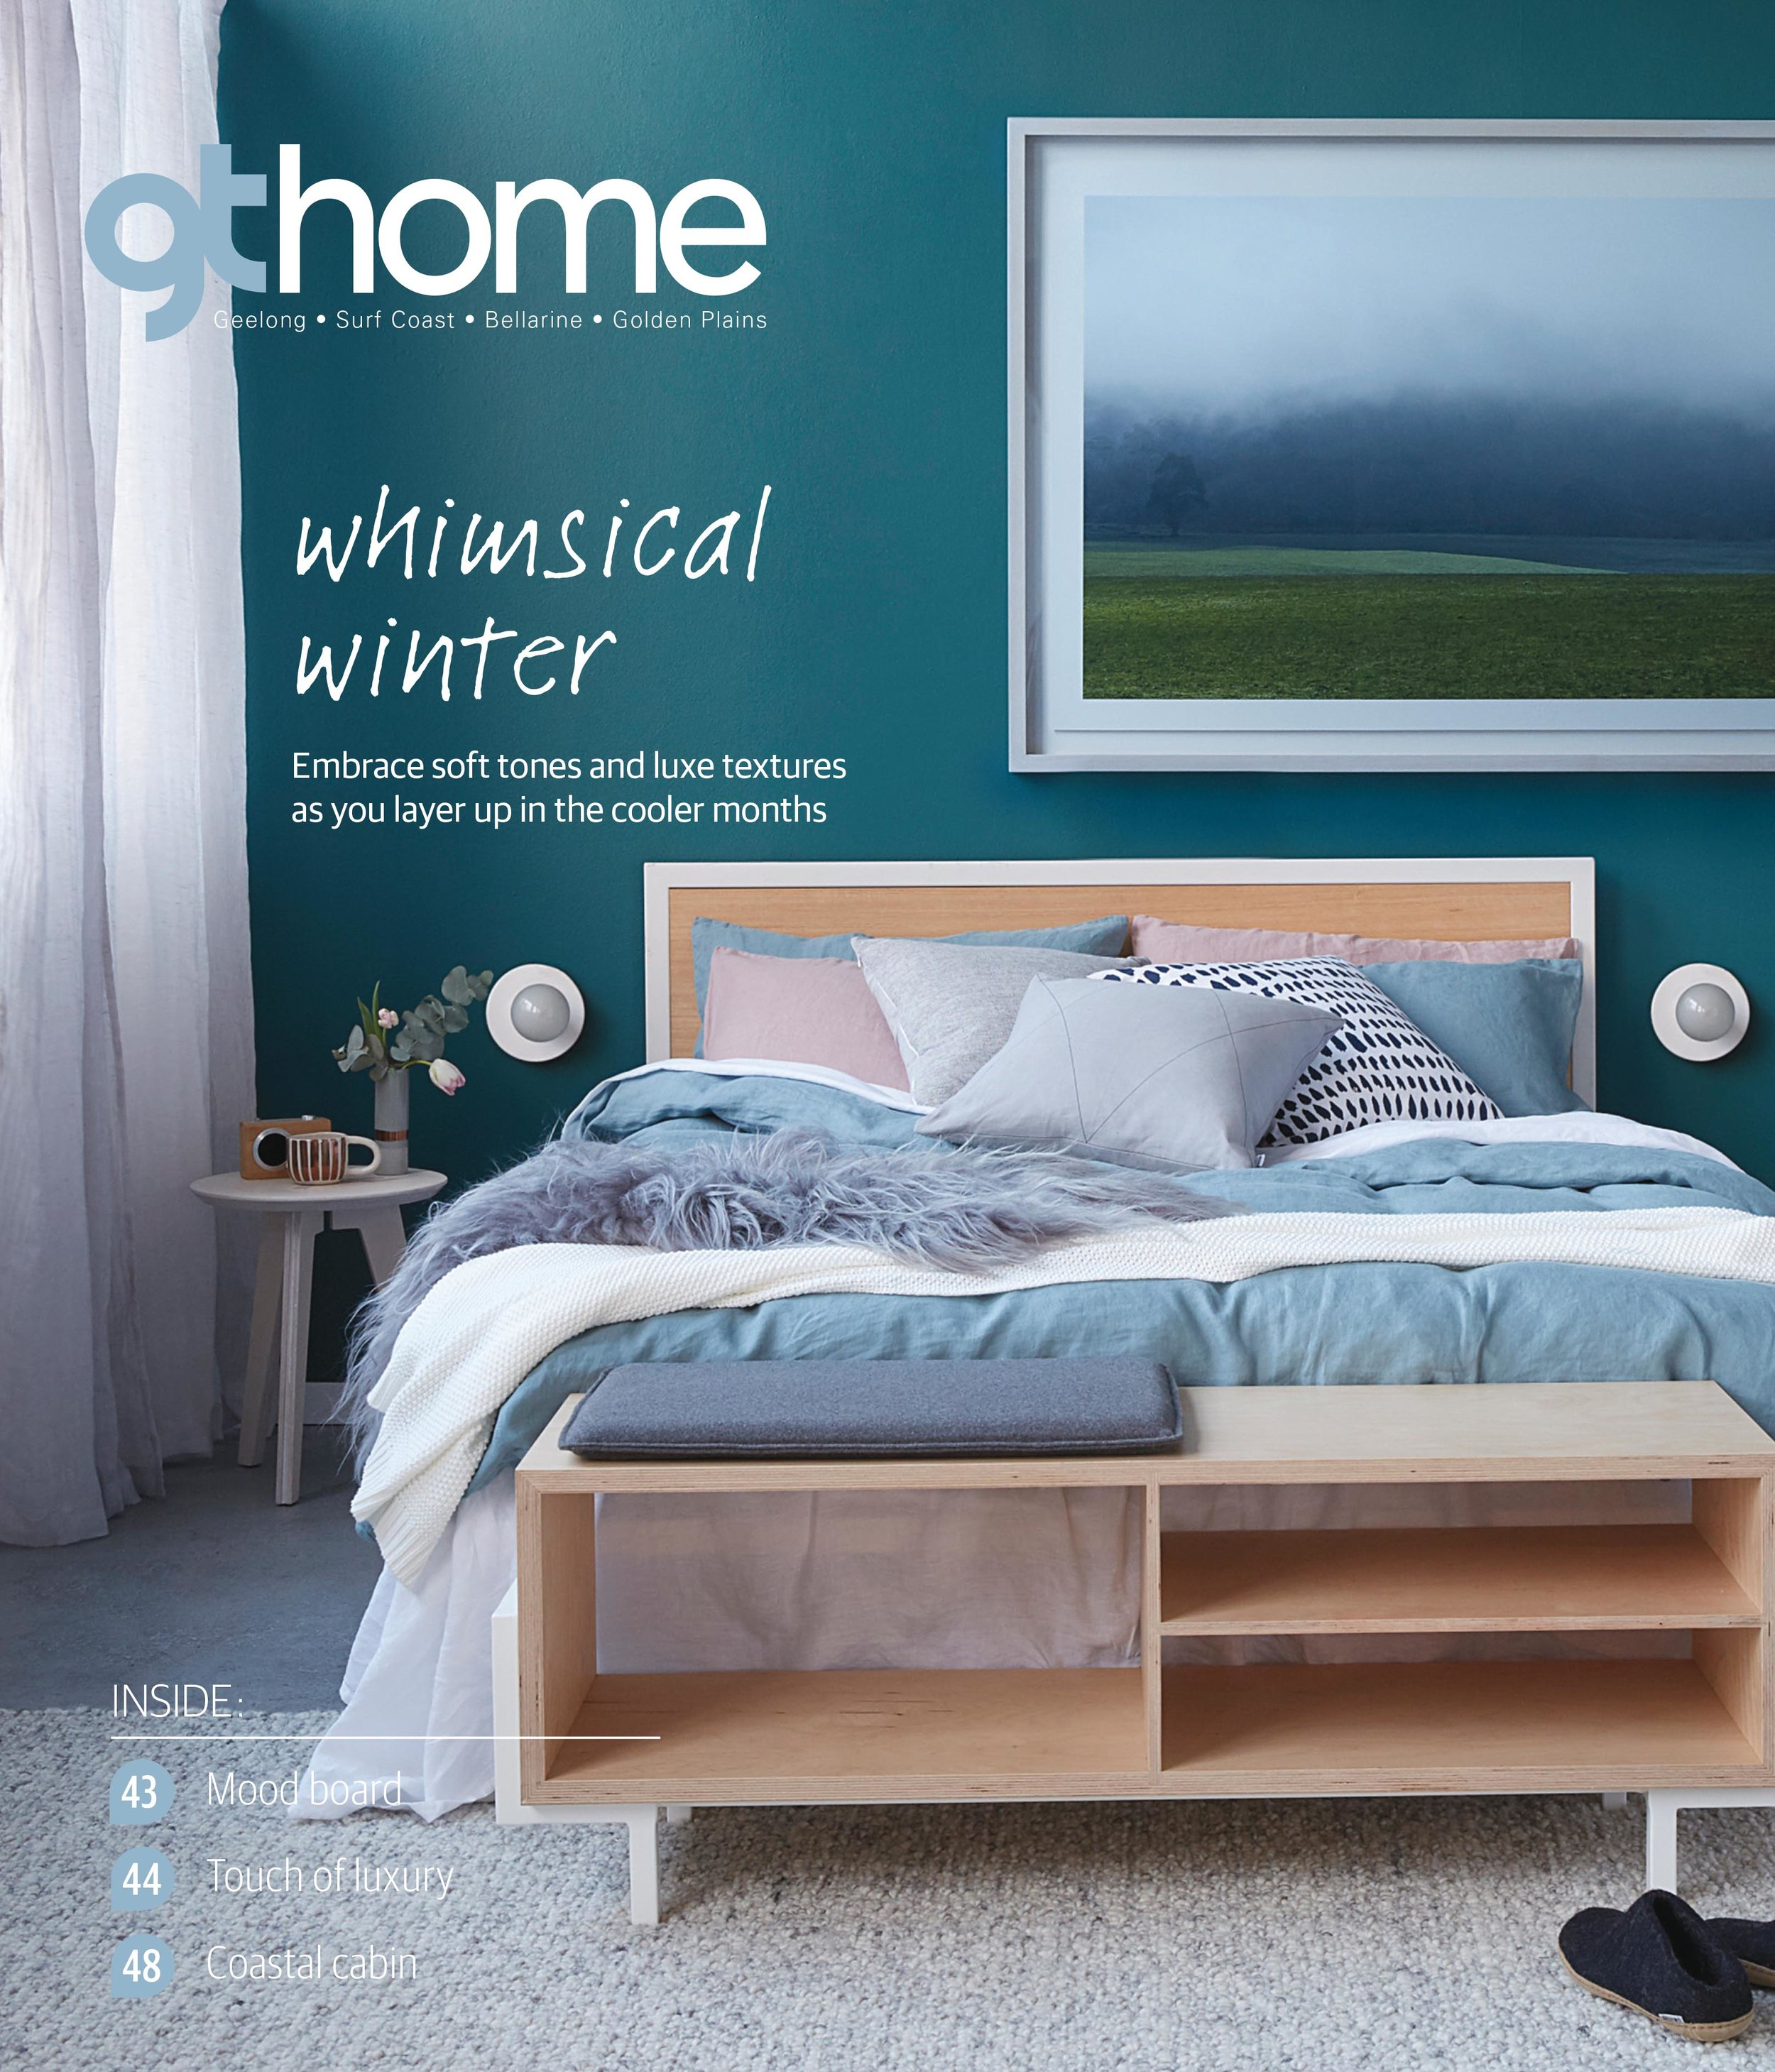 Maitland Street Interiors, Sarah Elshaug, Felix Furniture, GT Home, Bedroom Style, Interior Stylist Melbourne